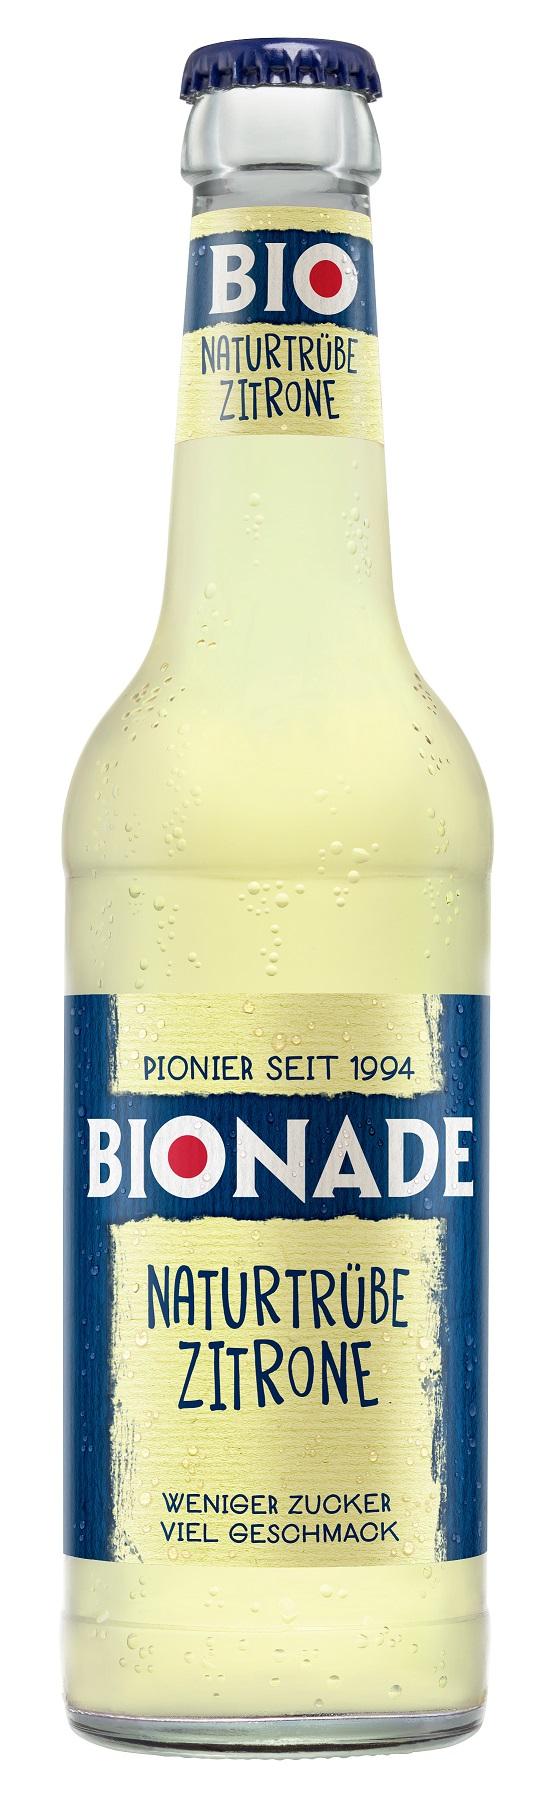 Bionade Zitrone trüb